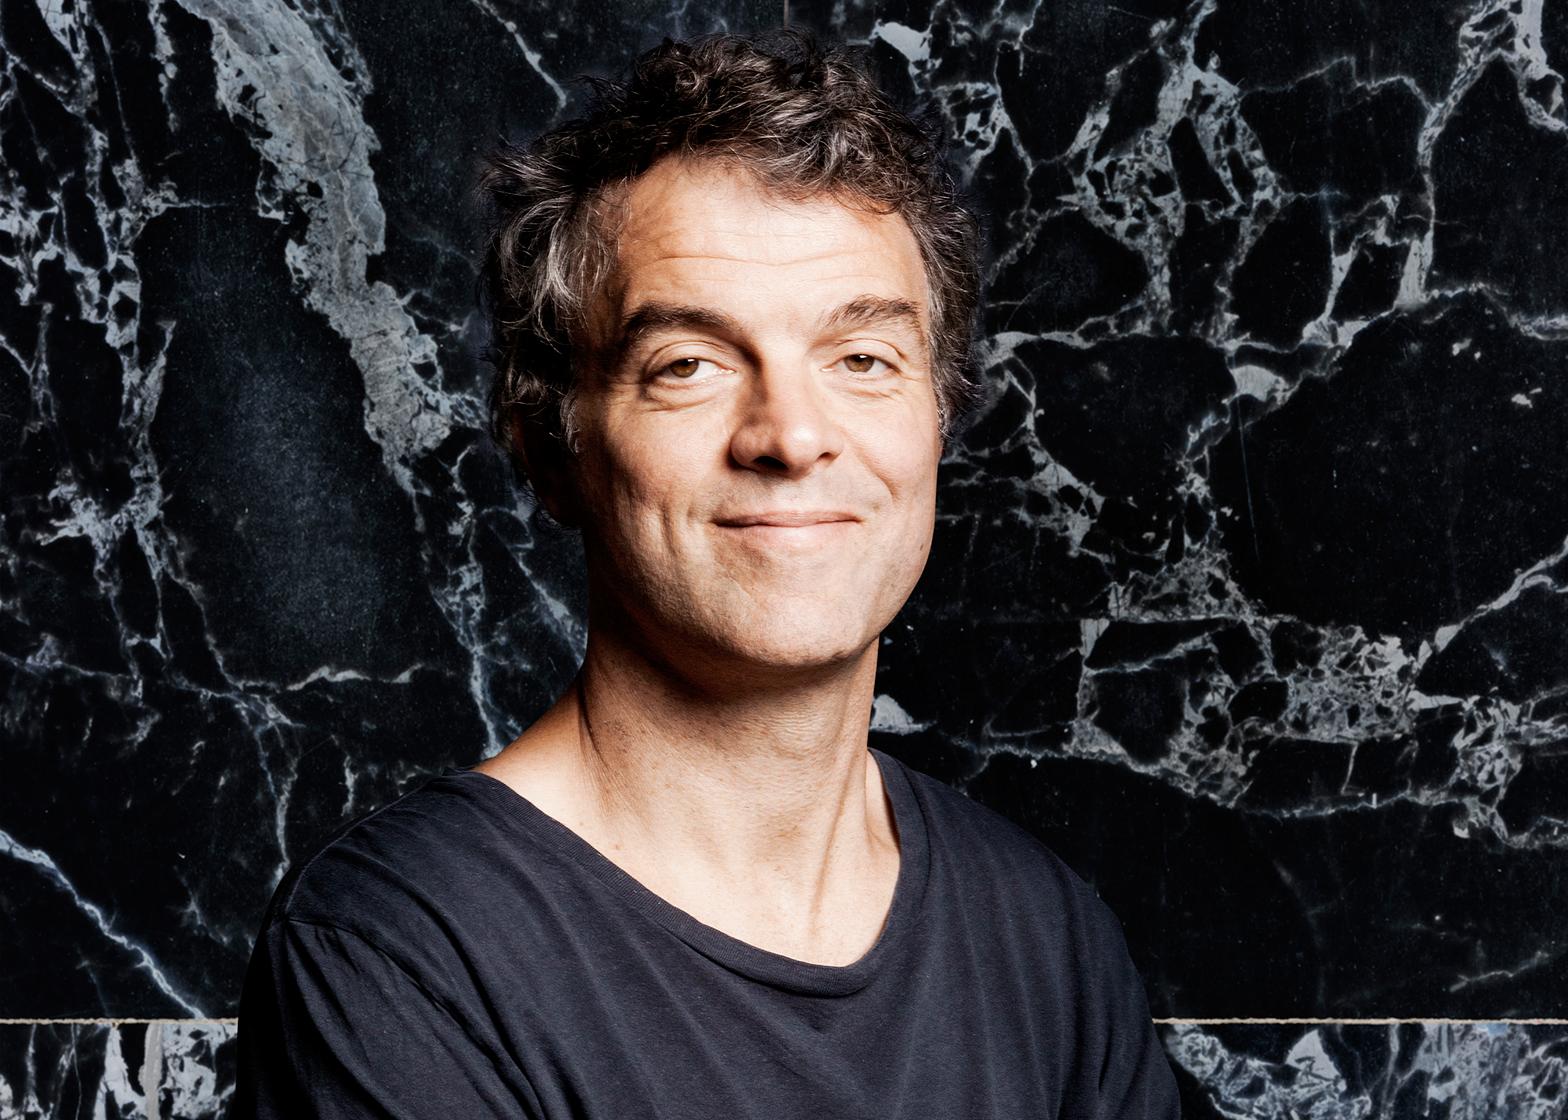 Piet Hein Eek portrait